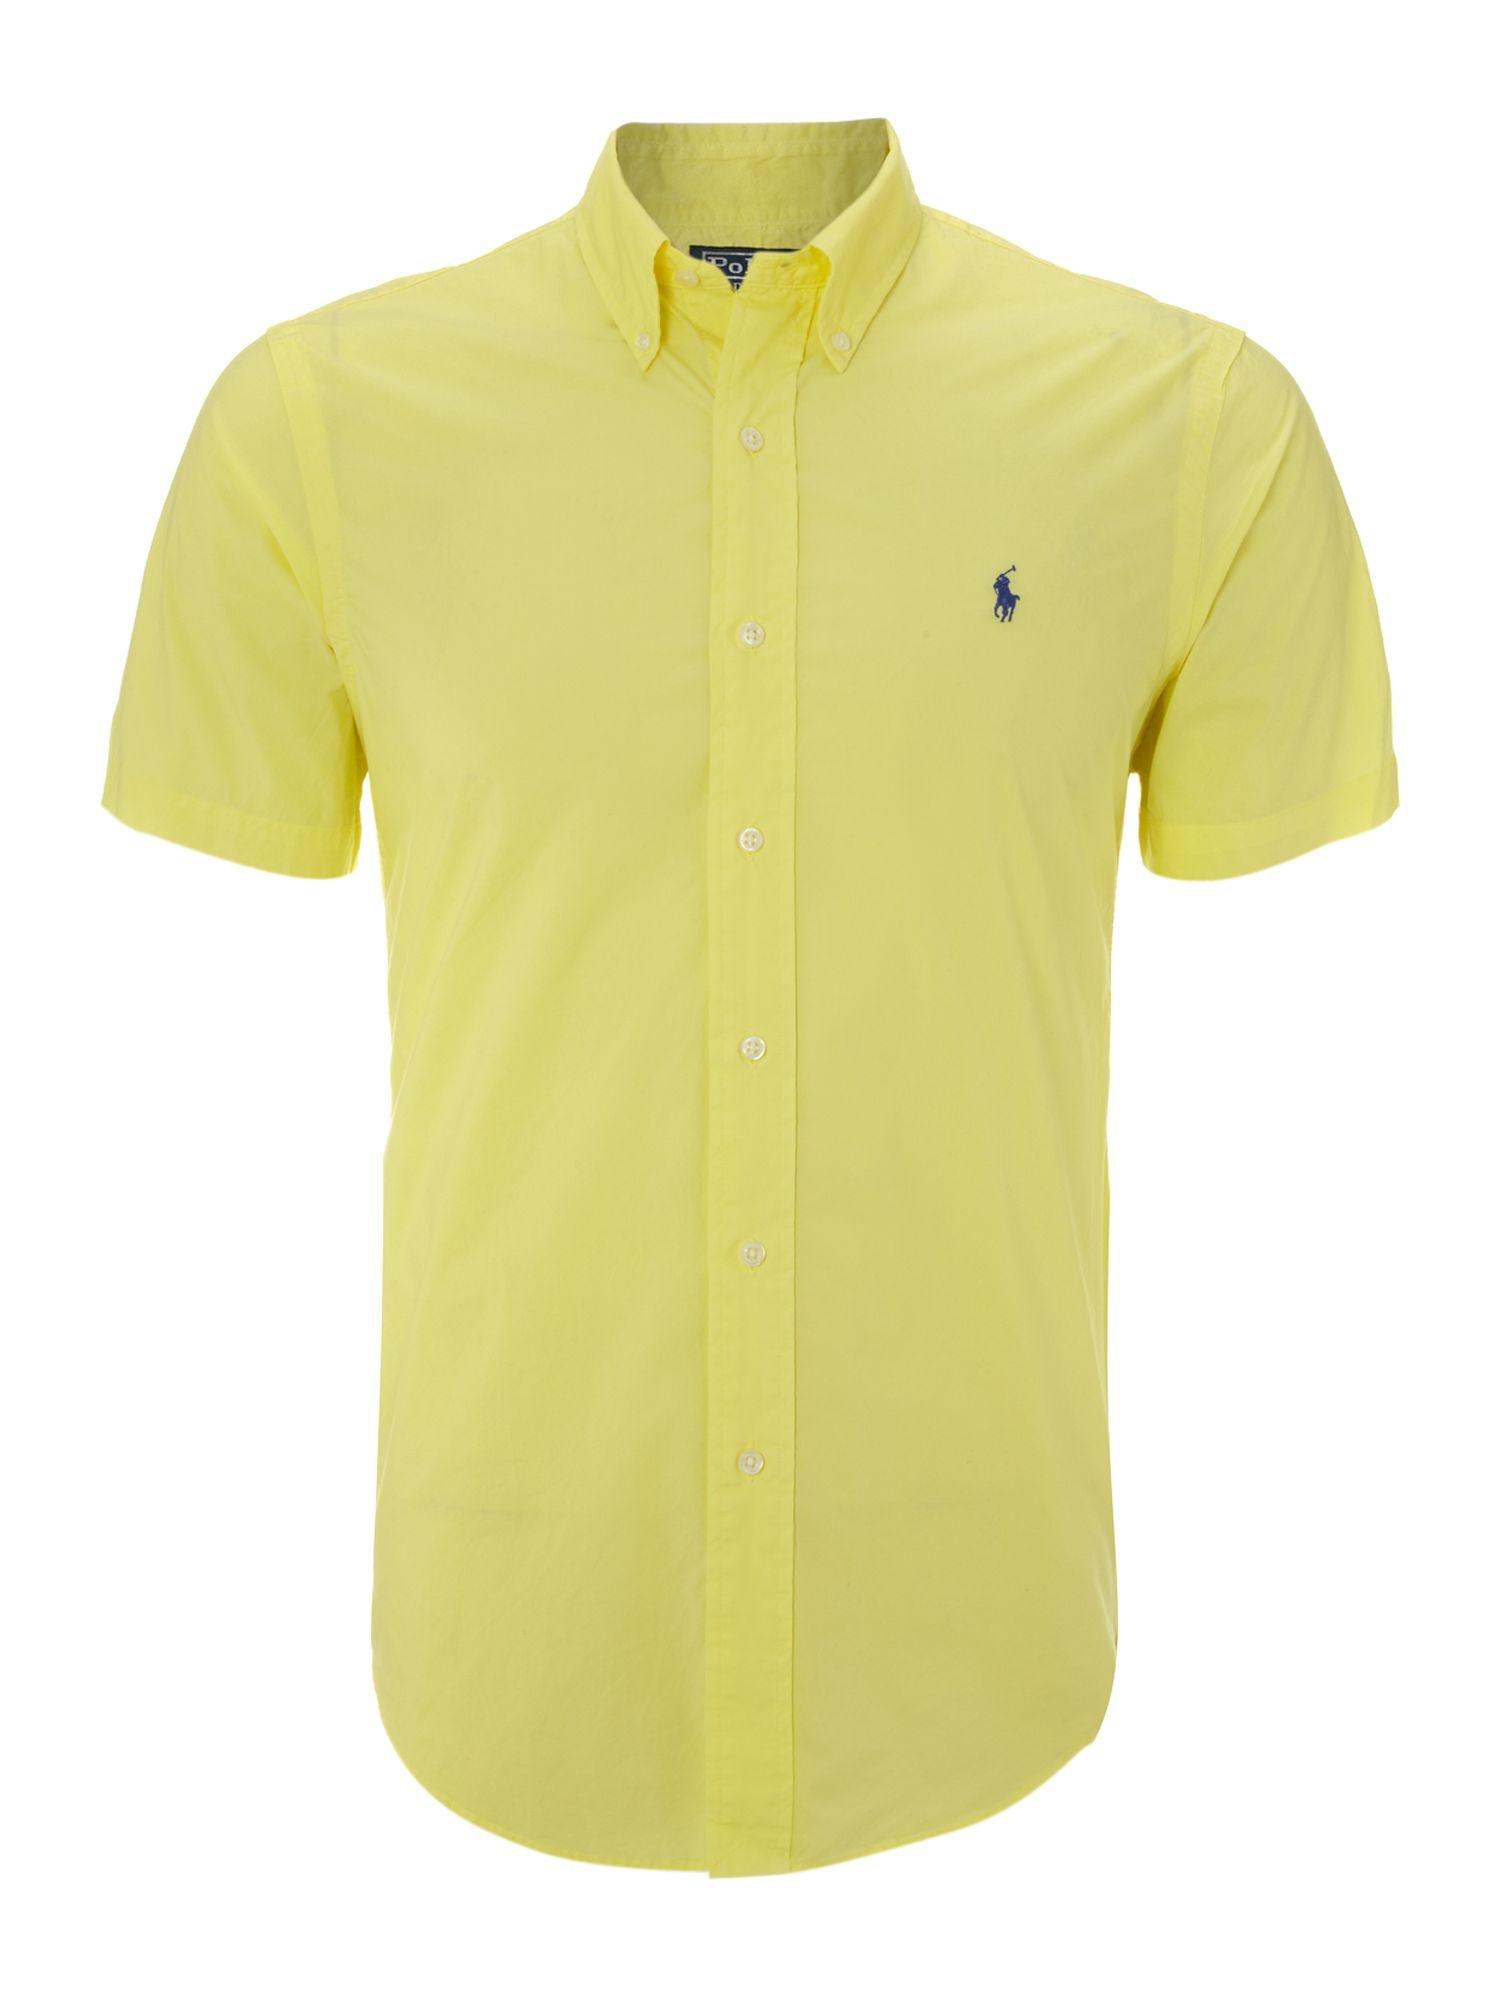 Polo Ralph Lauren Short Sleeved Classic Shirt In Yellow